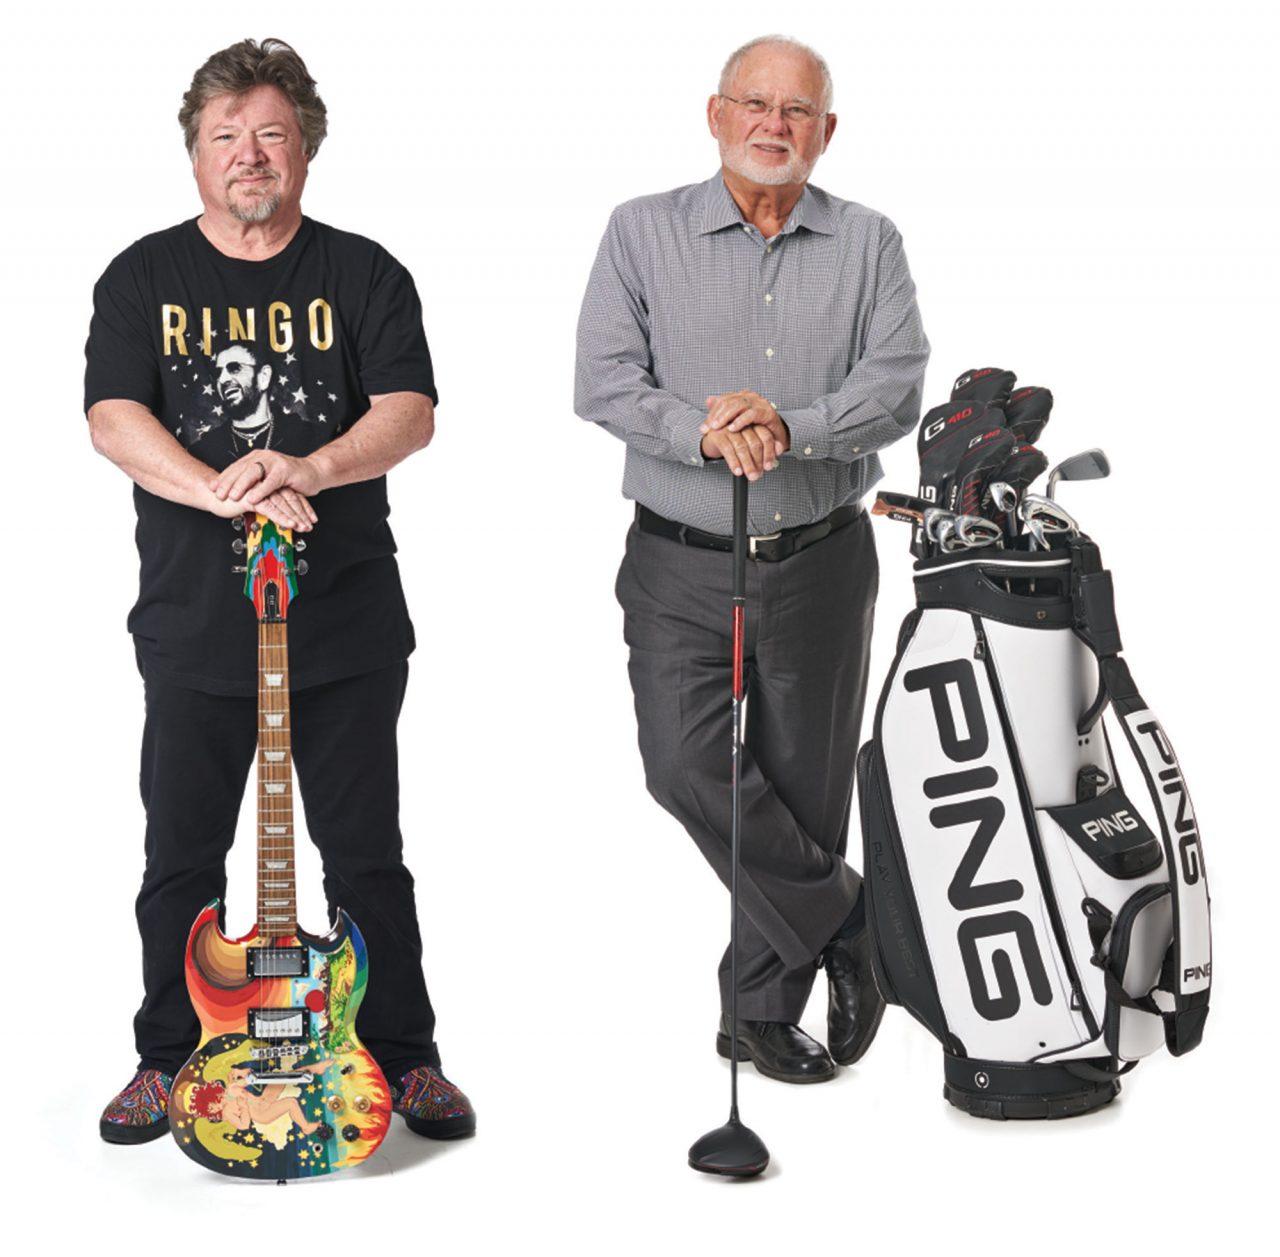 Left to right: Danny Zelisko, John A. Solheim; Photo by Camerawerks